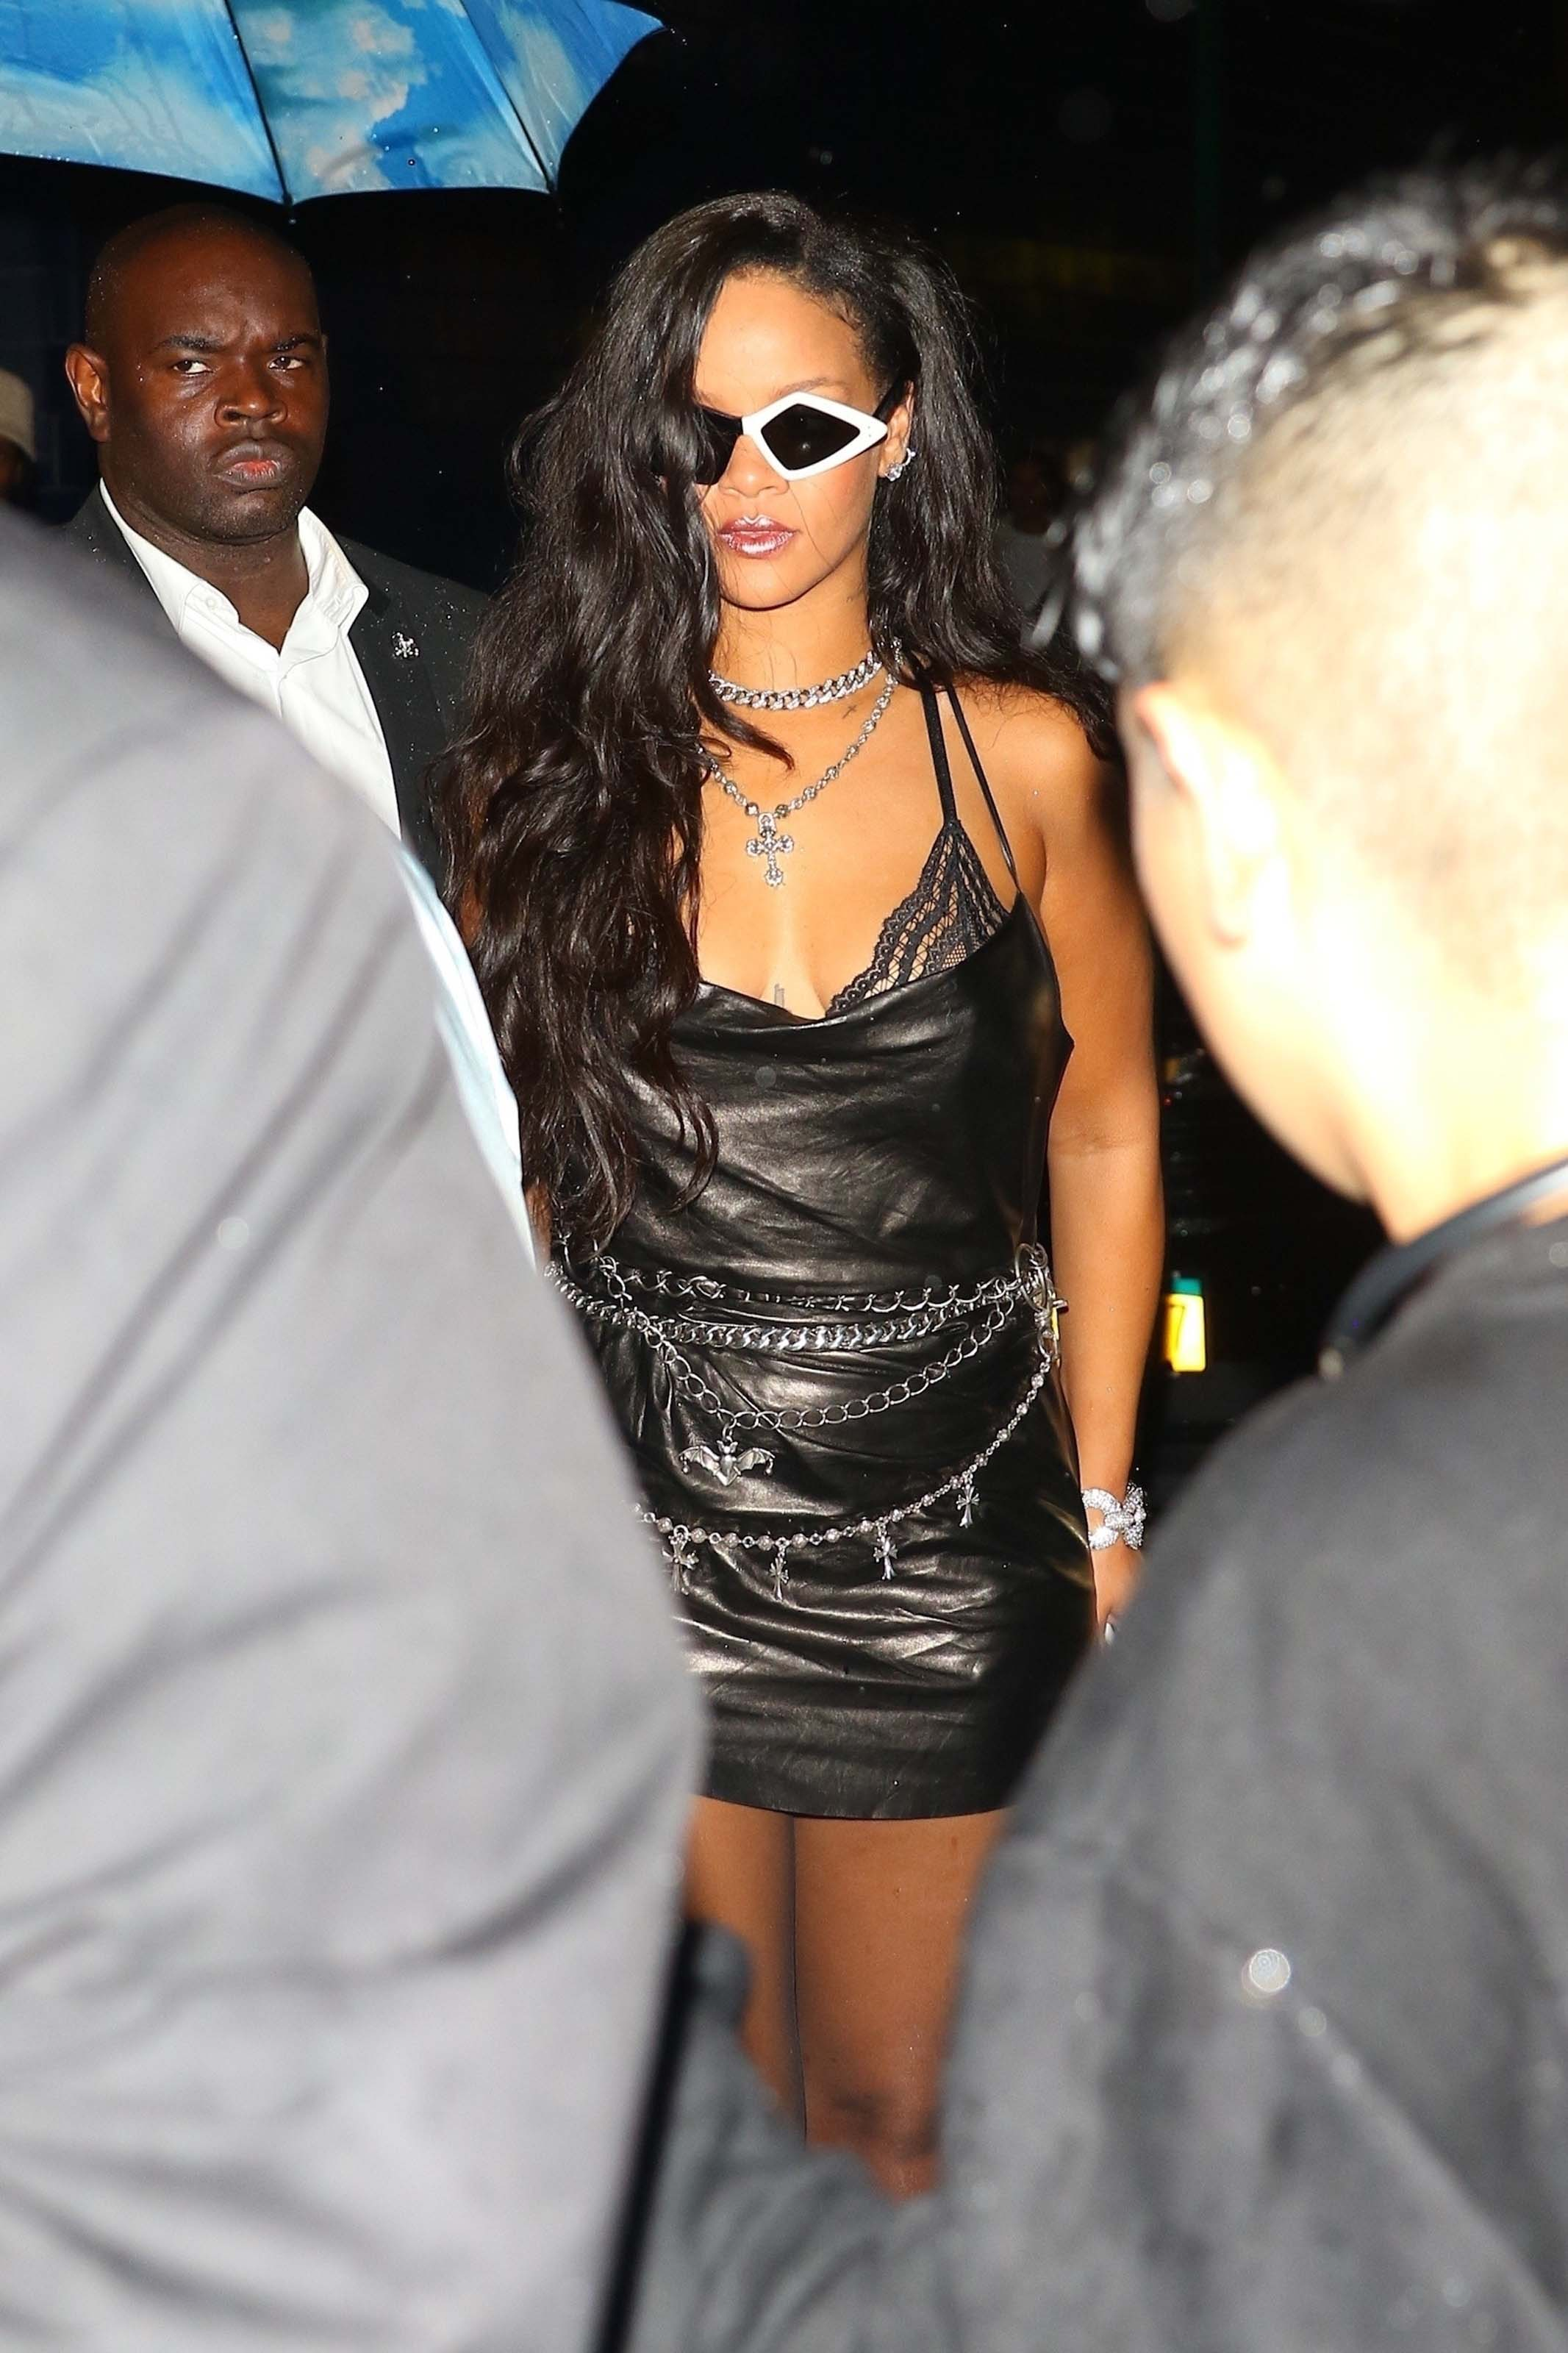 Rihanna attends Savage x Fenty Lingerie fashion show